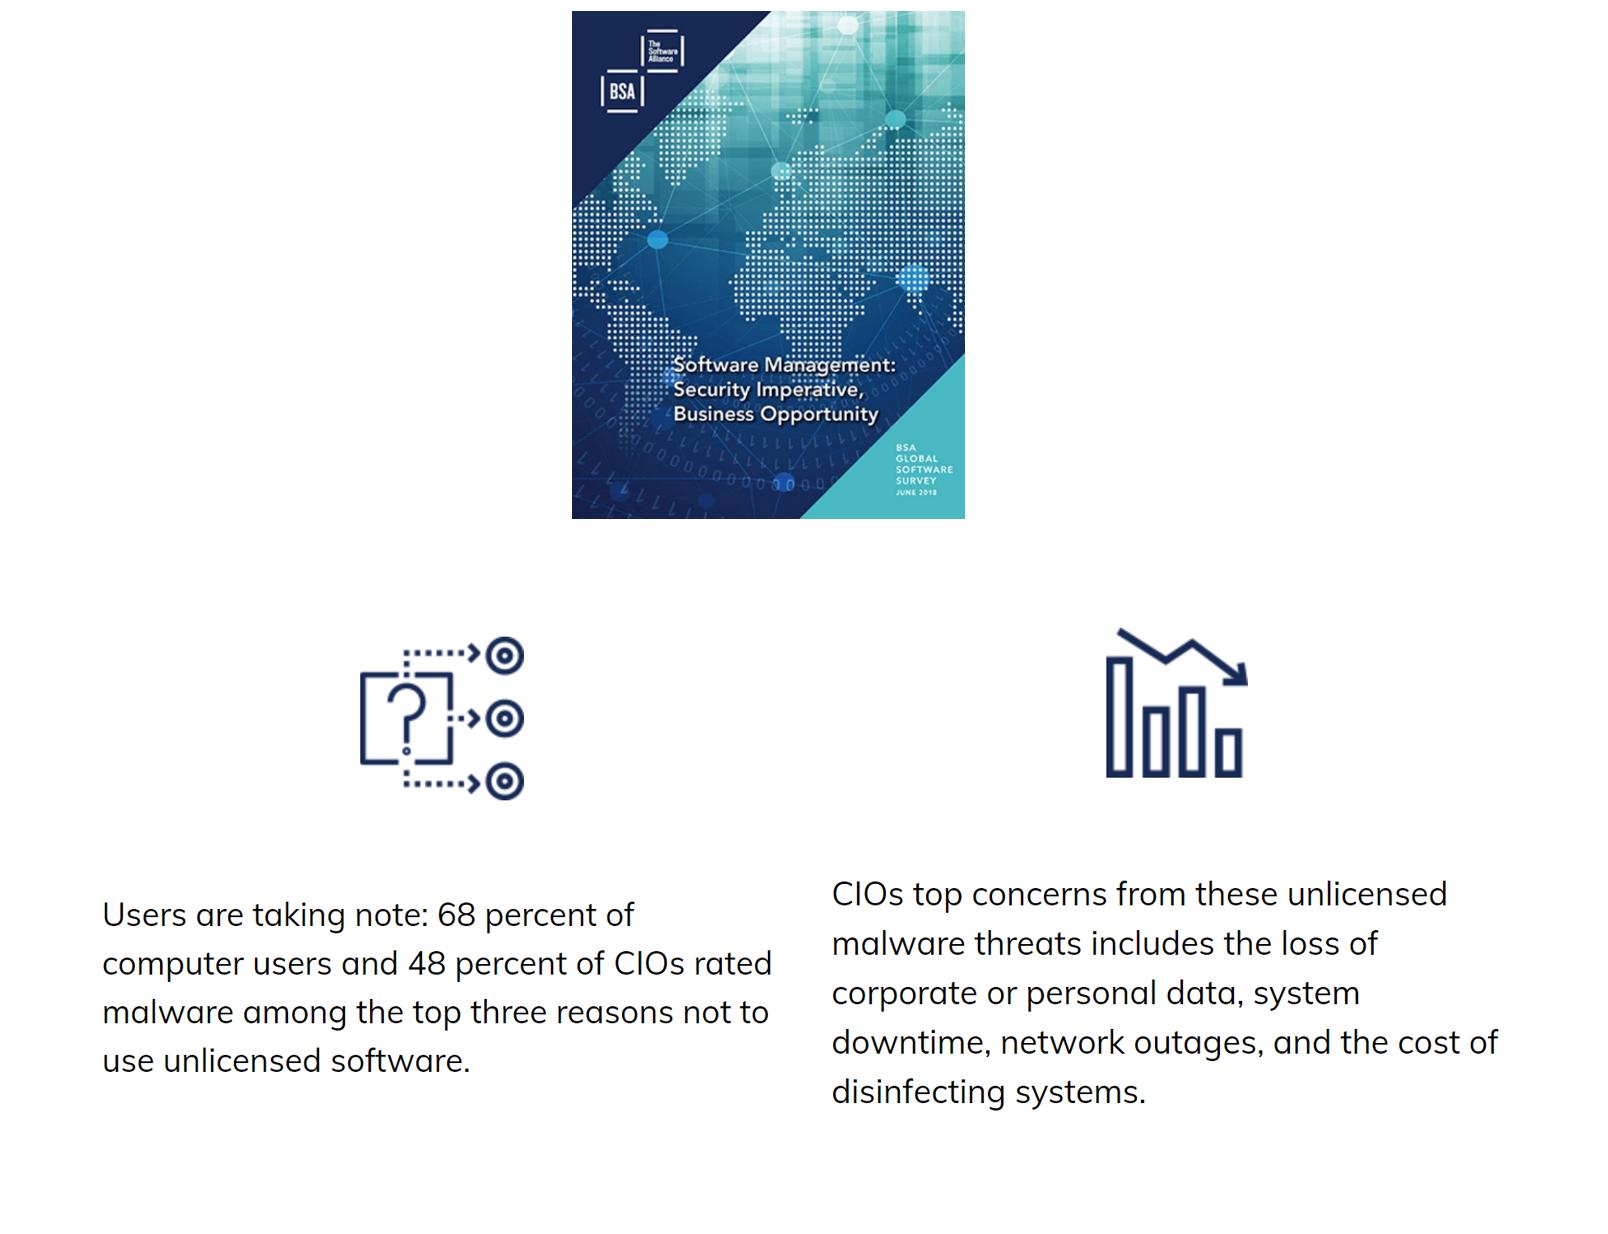 BSA Global Software Survey Results